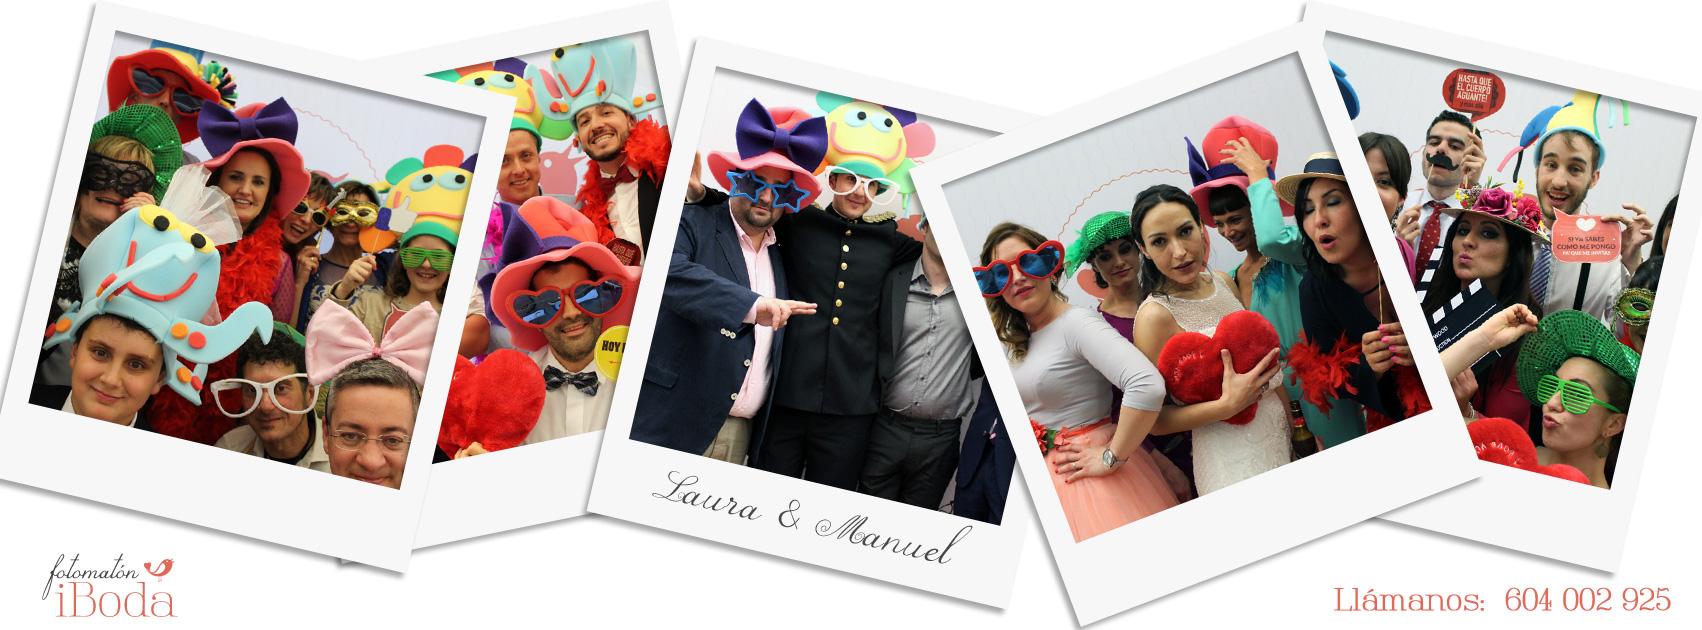 Laura & Manuel